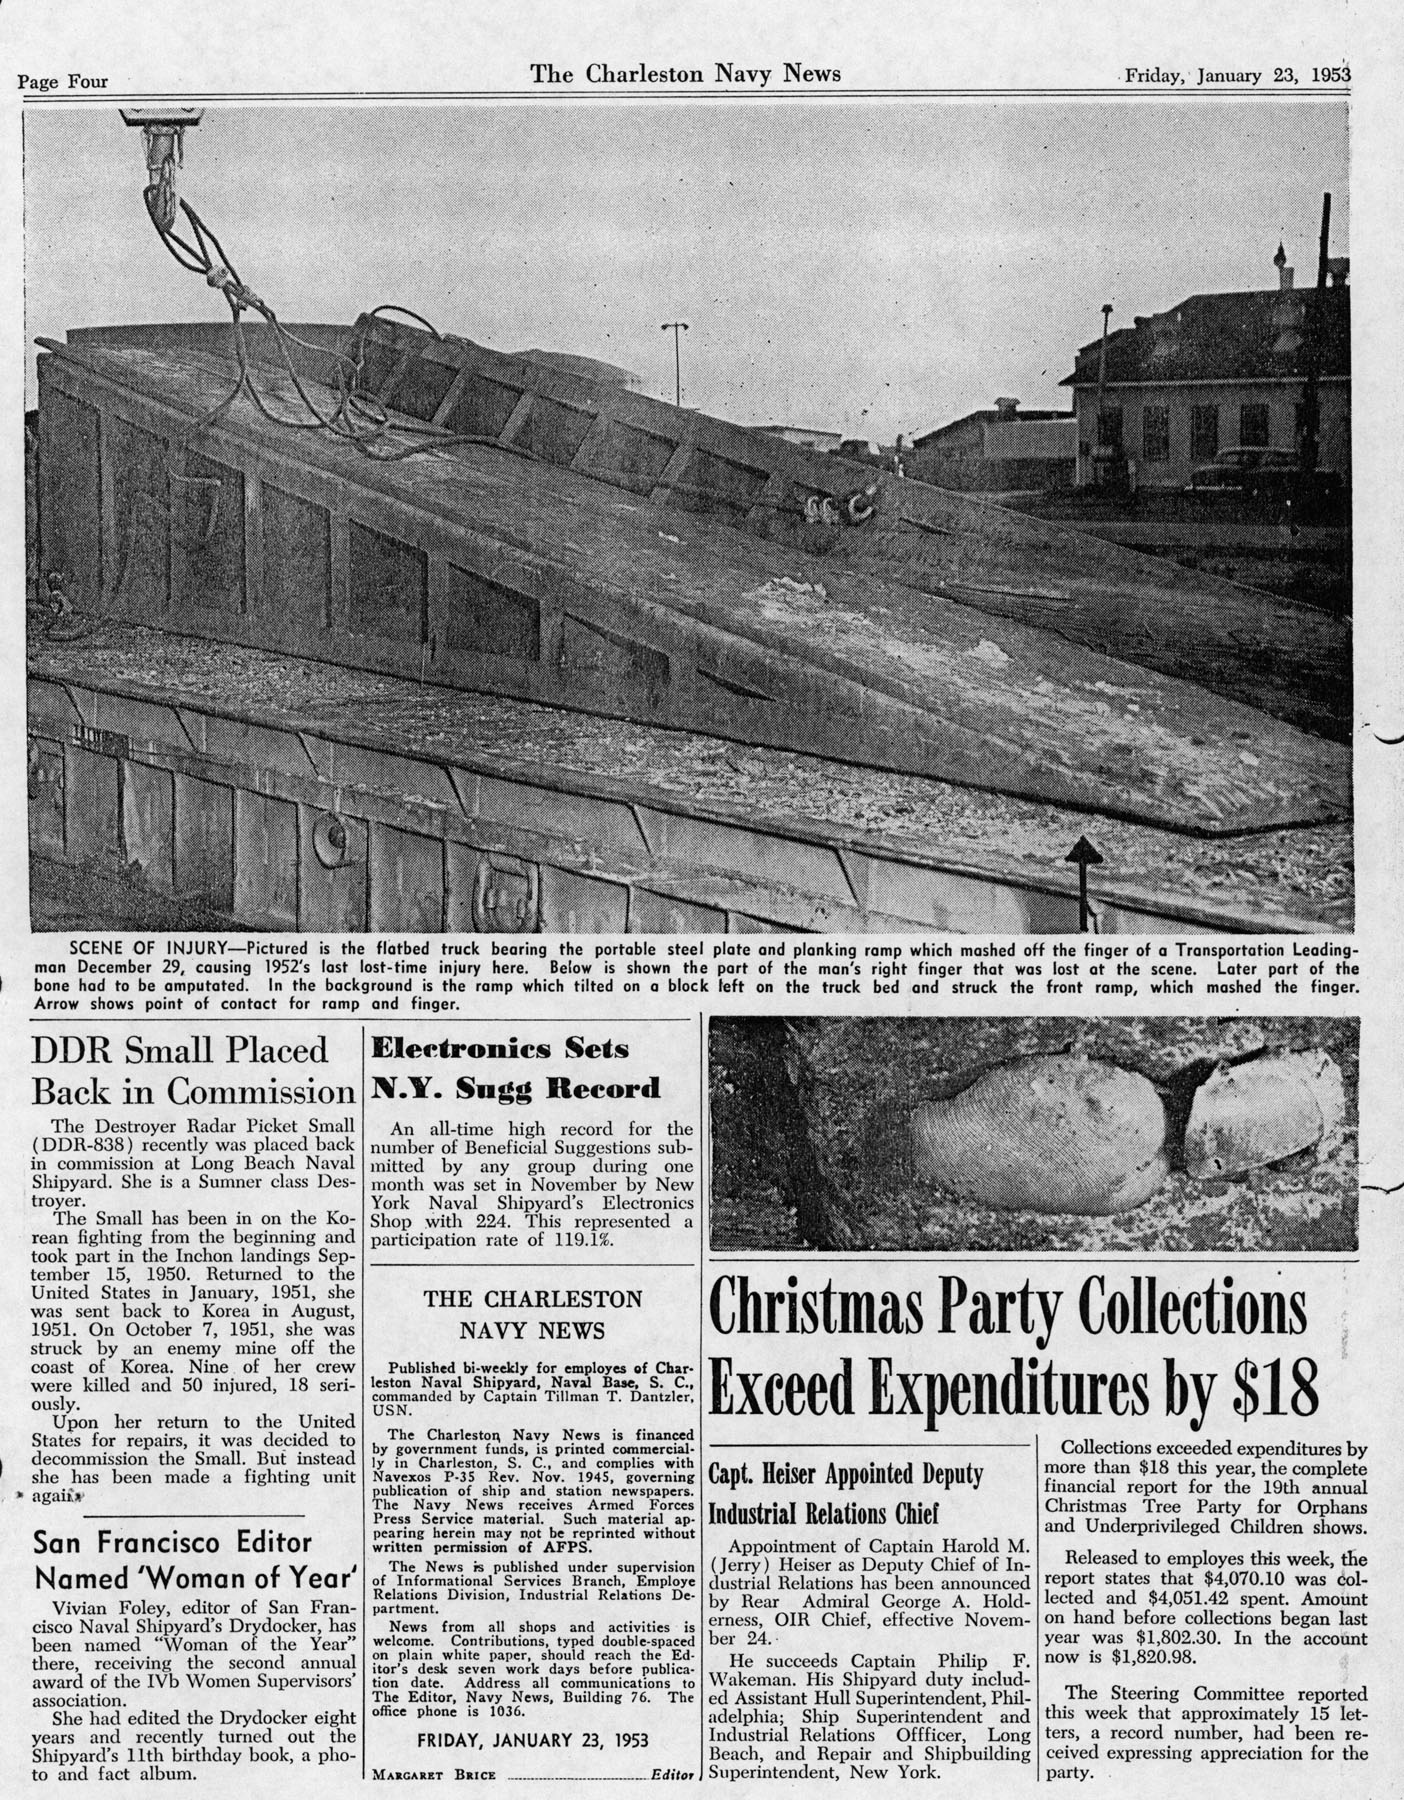 The Charleston Navy News, Volume 11, Edition 13, page iv